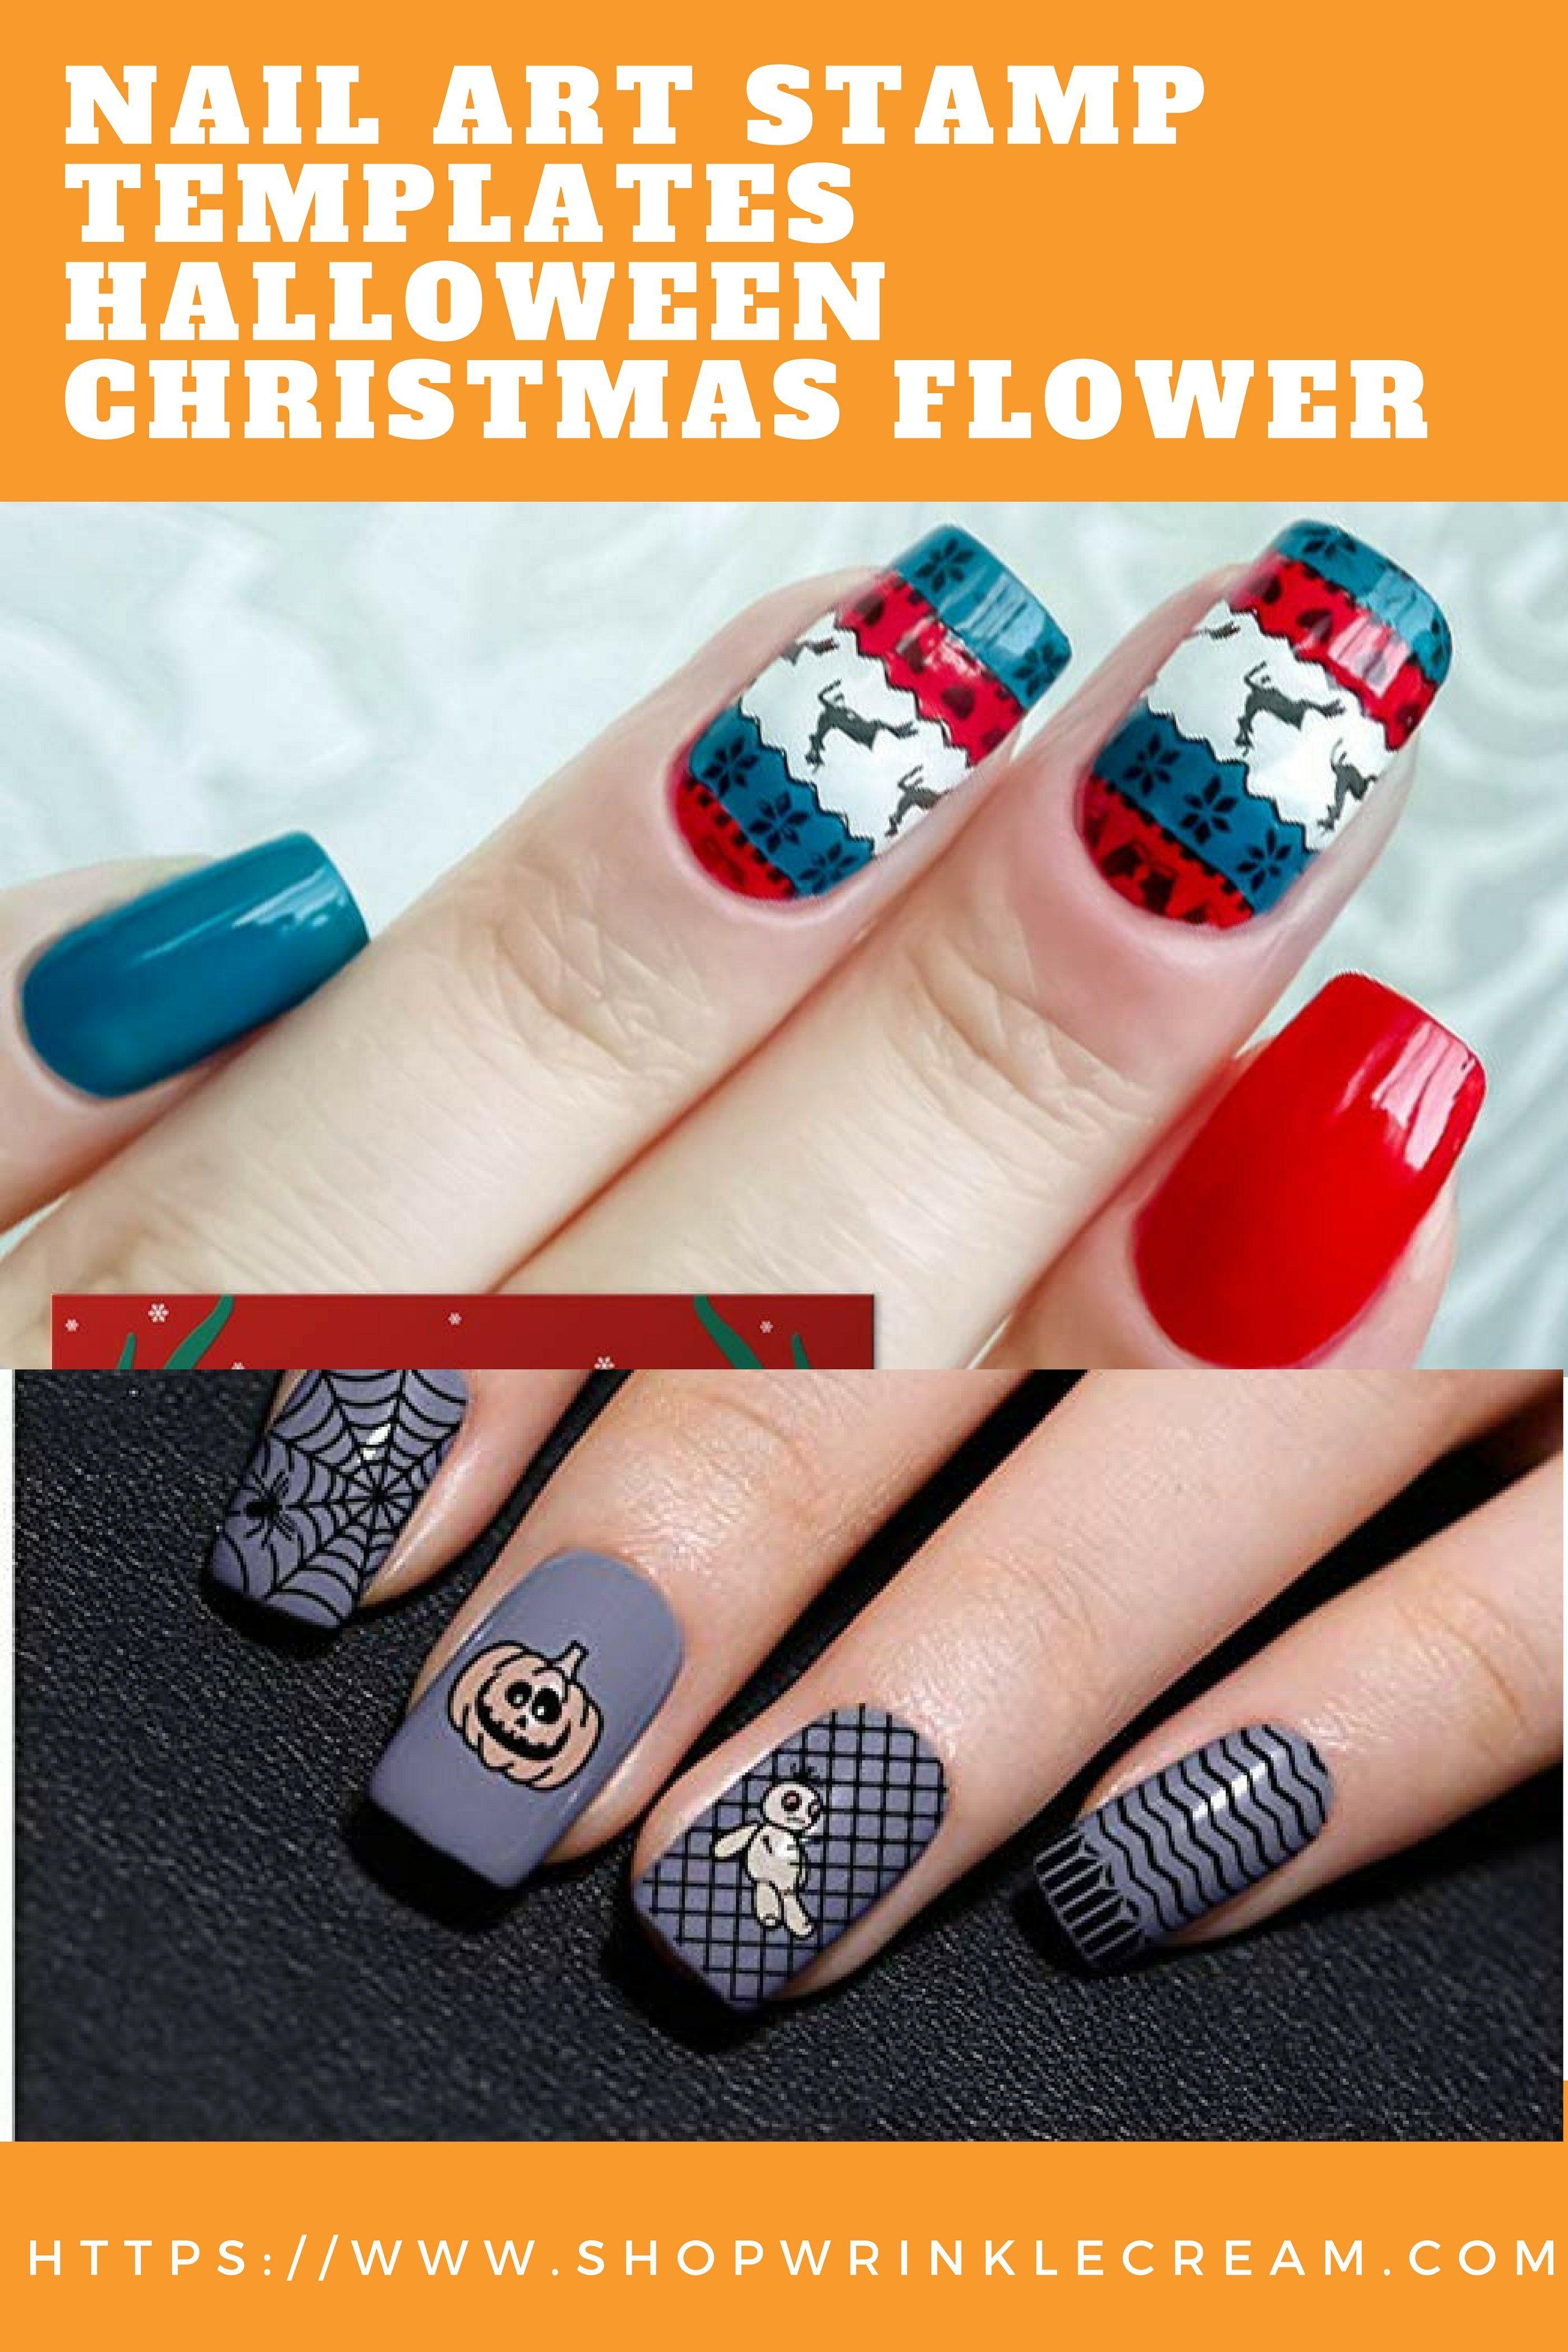 BORN PRETTY Nail Art Stamp Templates Halloween Christmas Flower